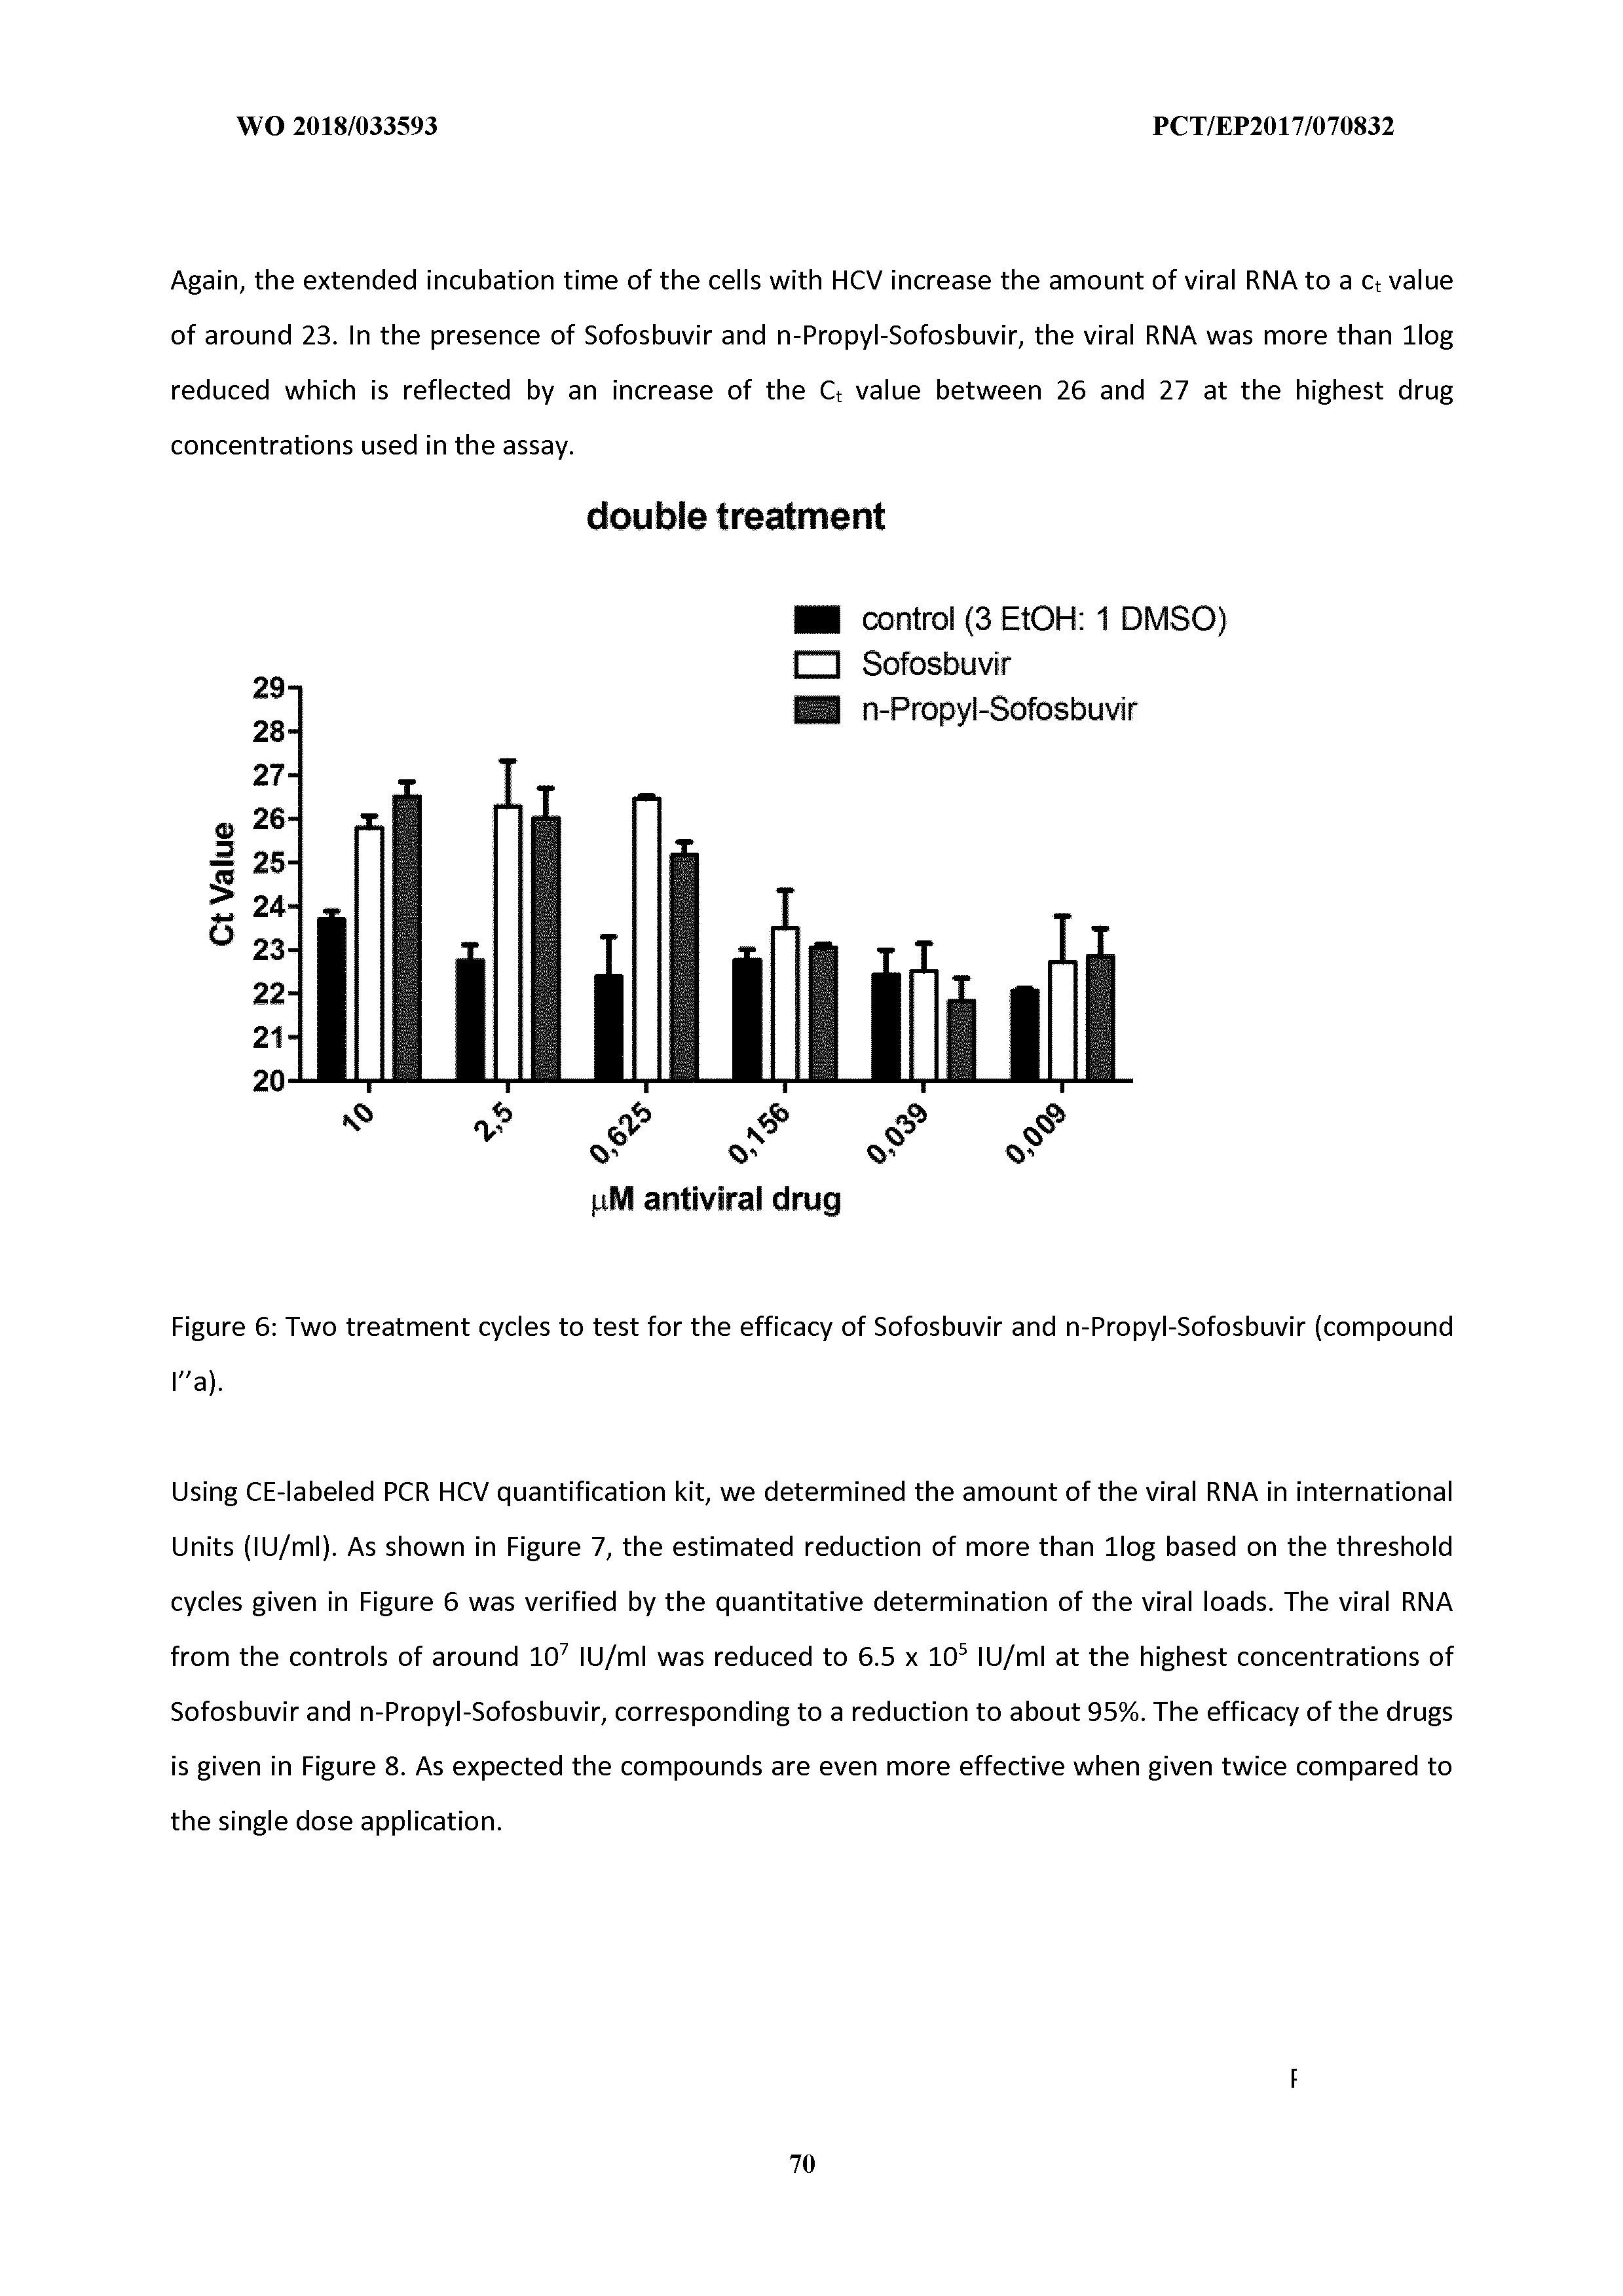 WO 2018/033593 A1 - Sofosbuvir Derivatives For The Treatment